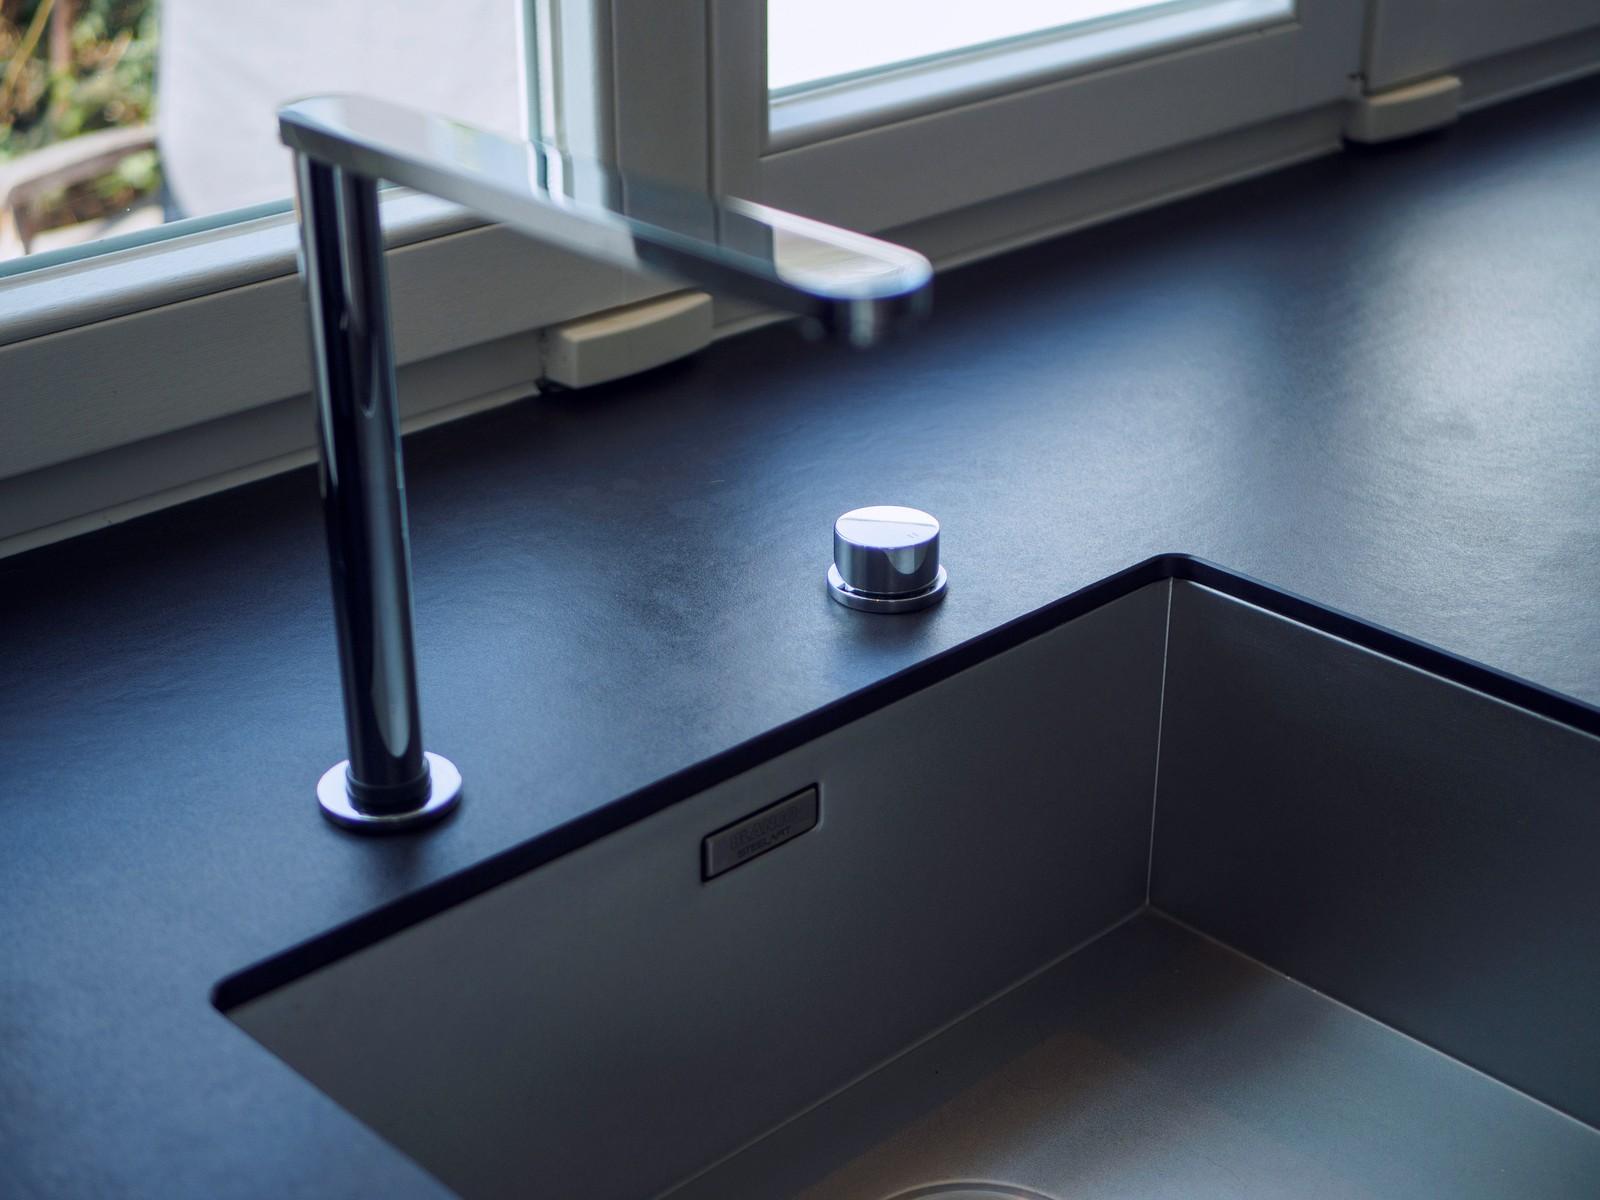 Kueche Exklusiv Design Fronten Holz Furnier Sonnenverbrannt Stahl Keramik Arbeitsplatte Miele 27